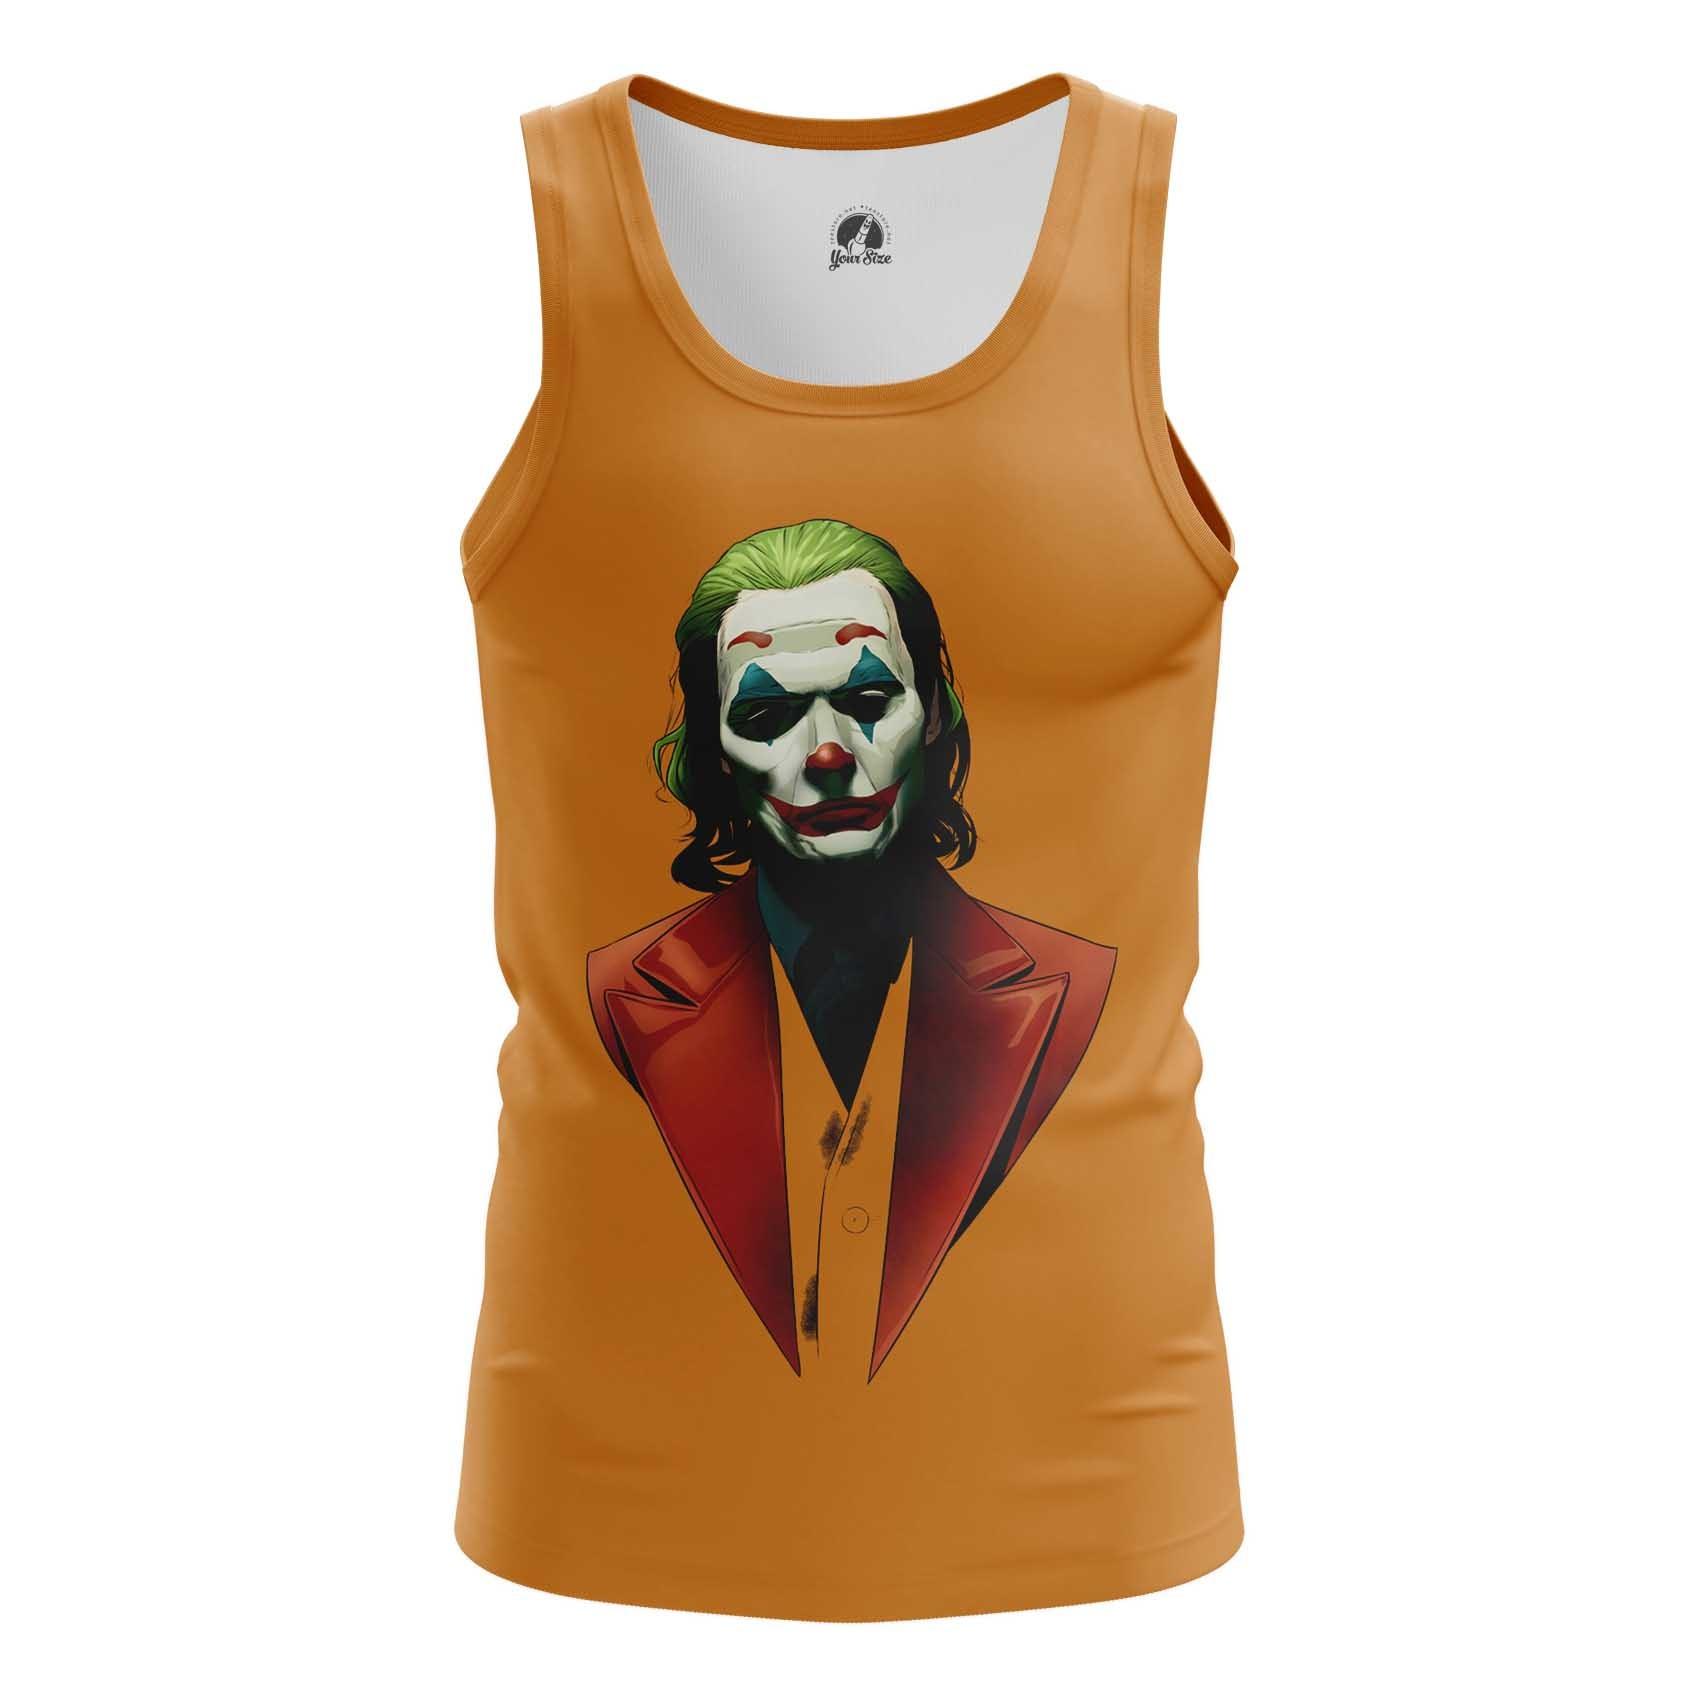 Collectibles Orange Men'S Tank Joker Movie 2019 Vest